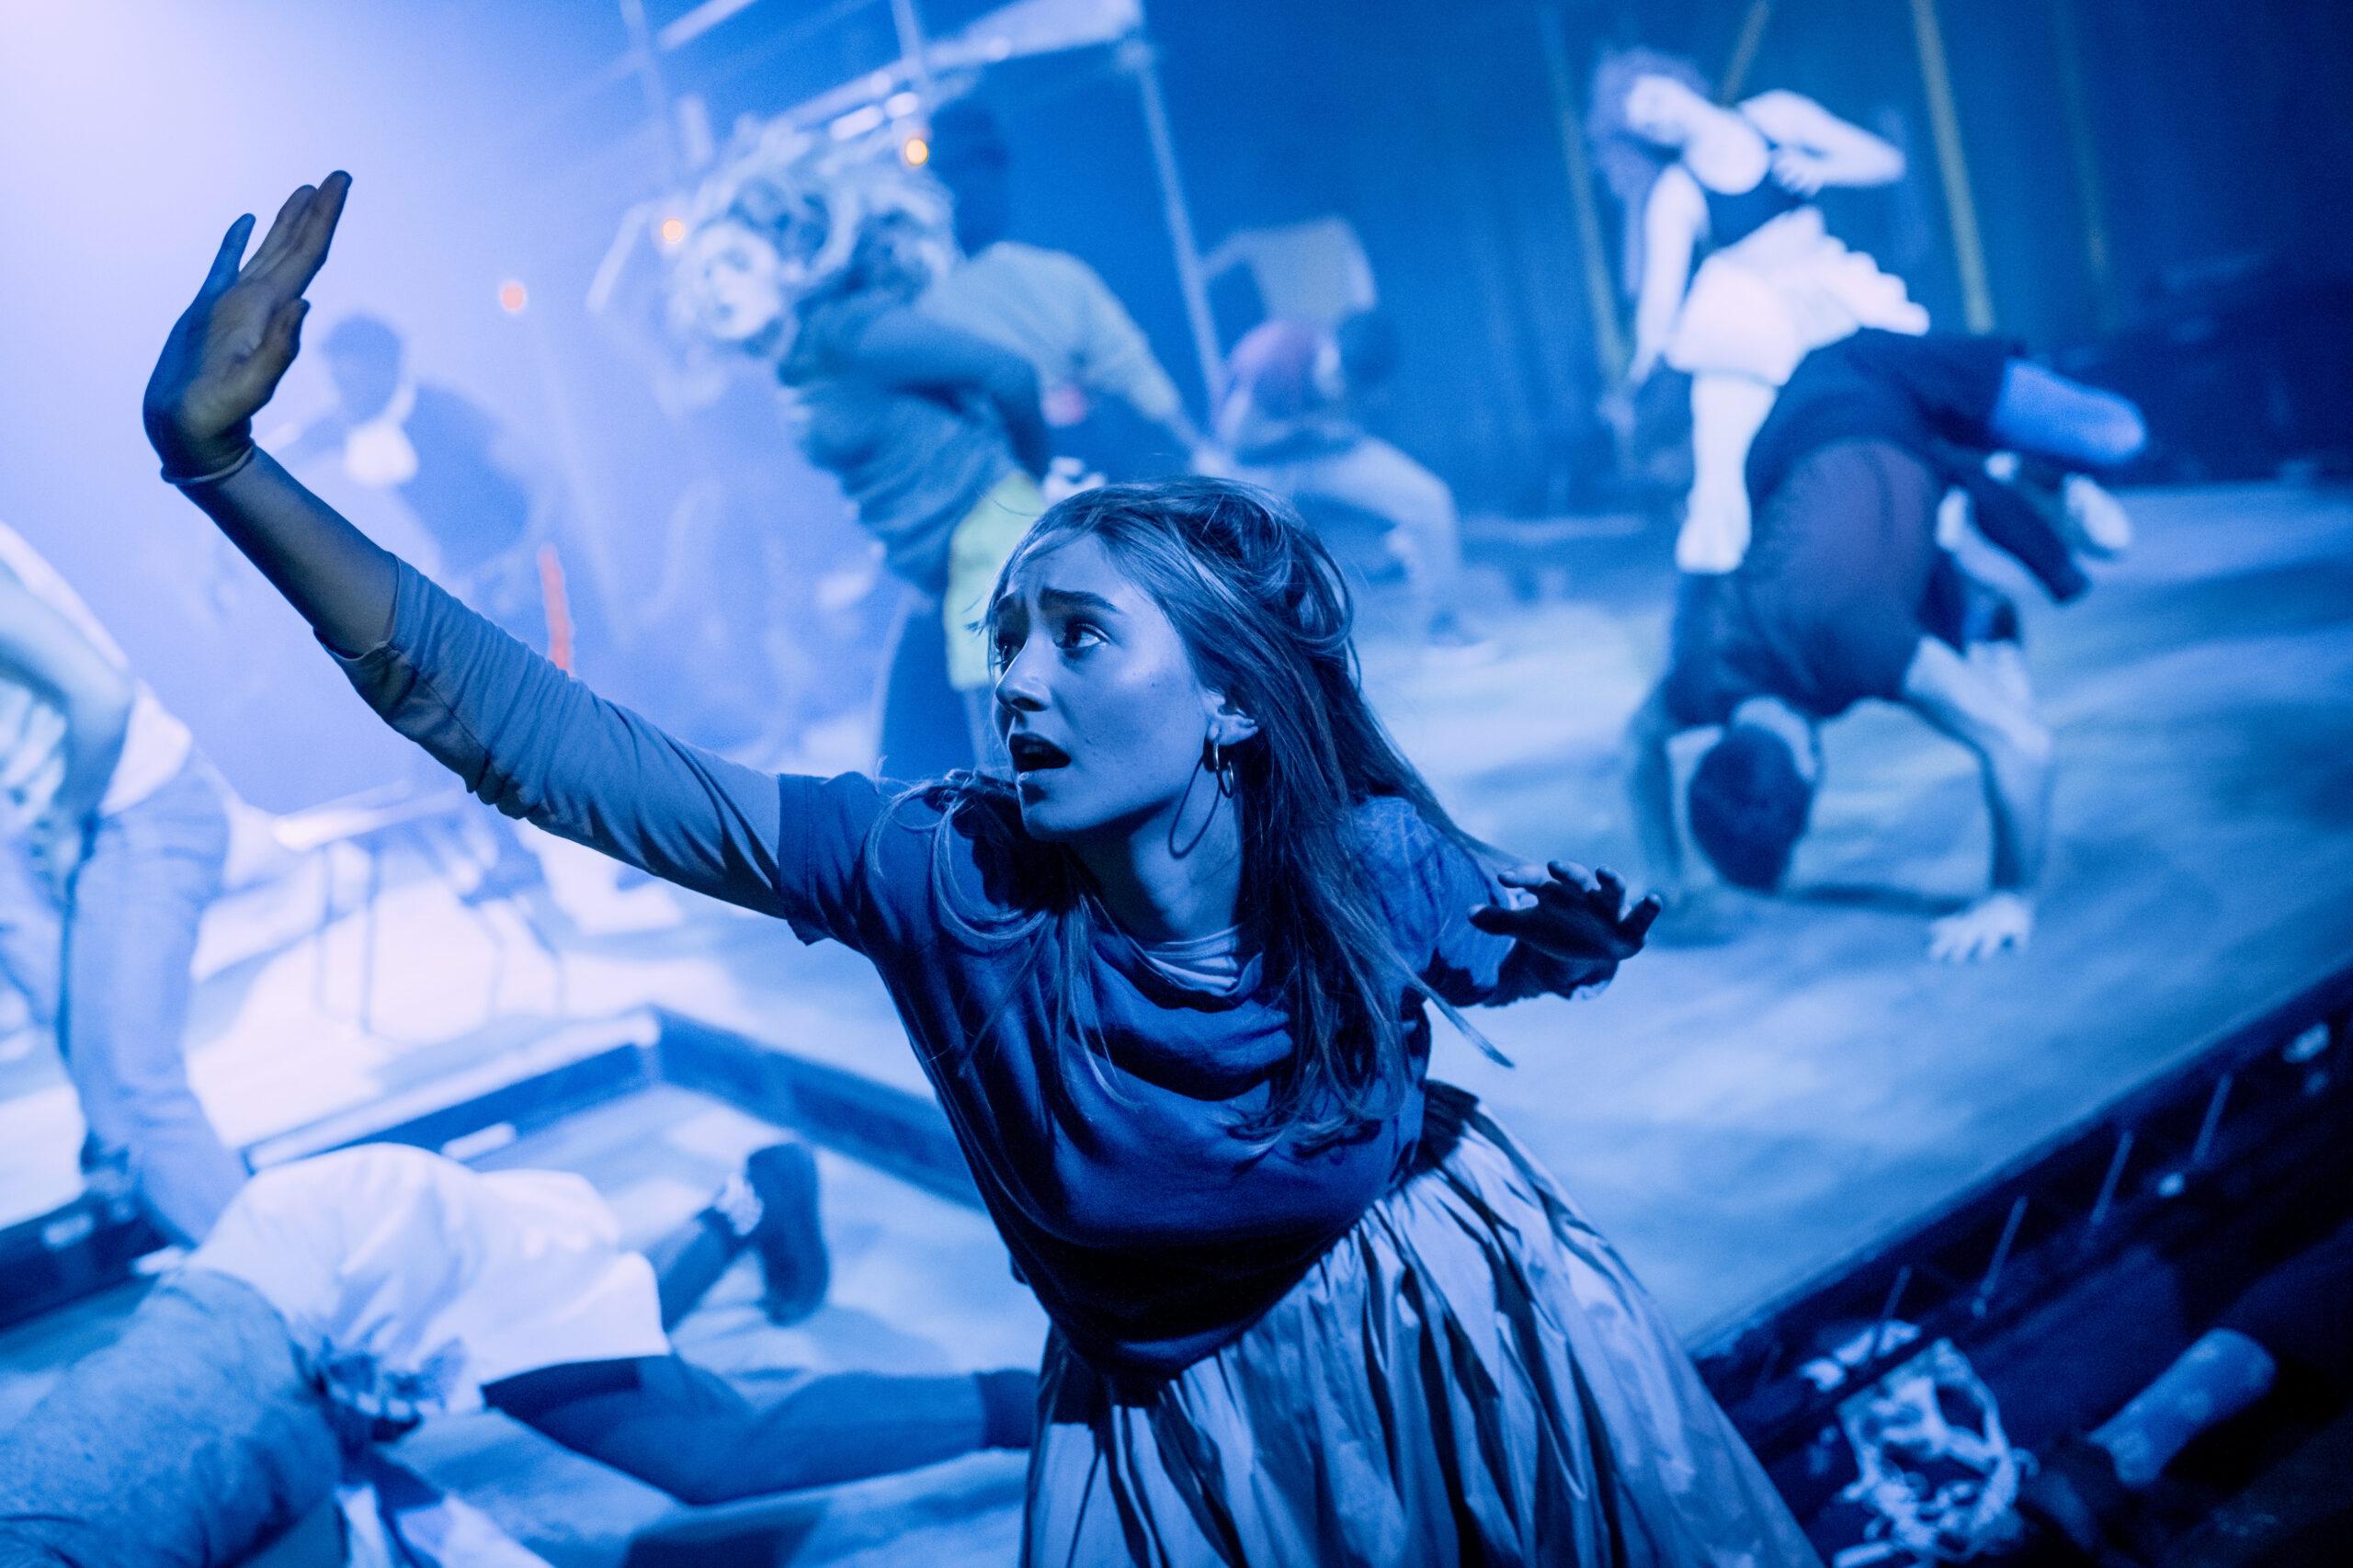 Guildhall School of Music & Drama / Mihaela Bodlovic